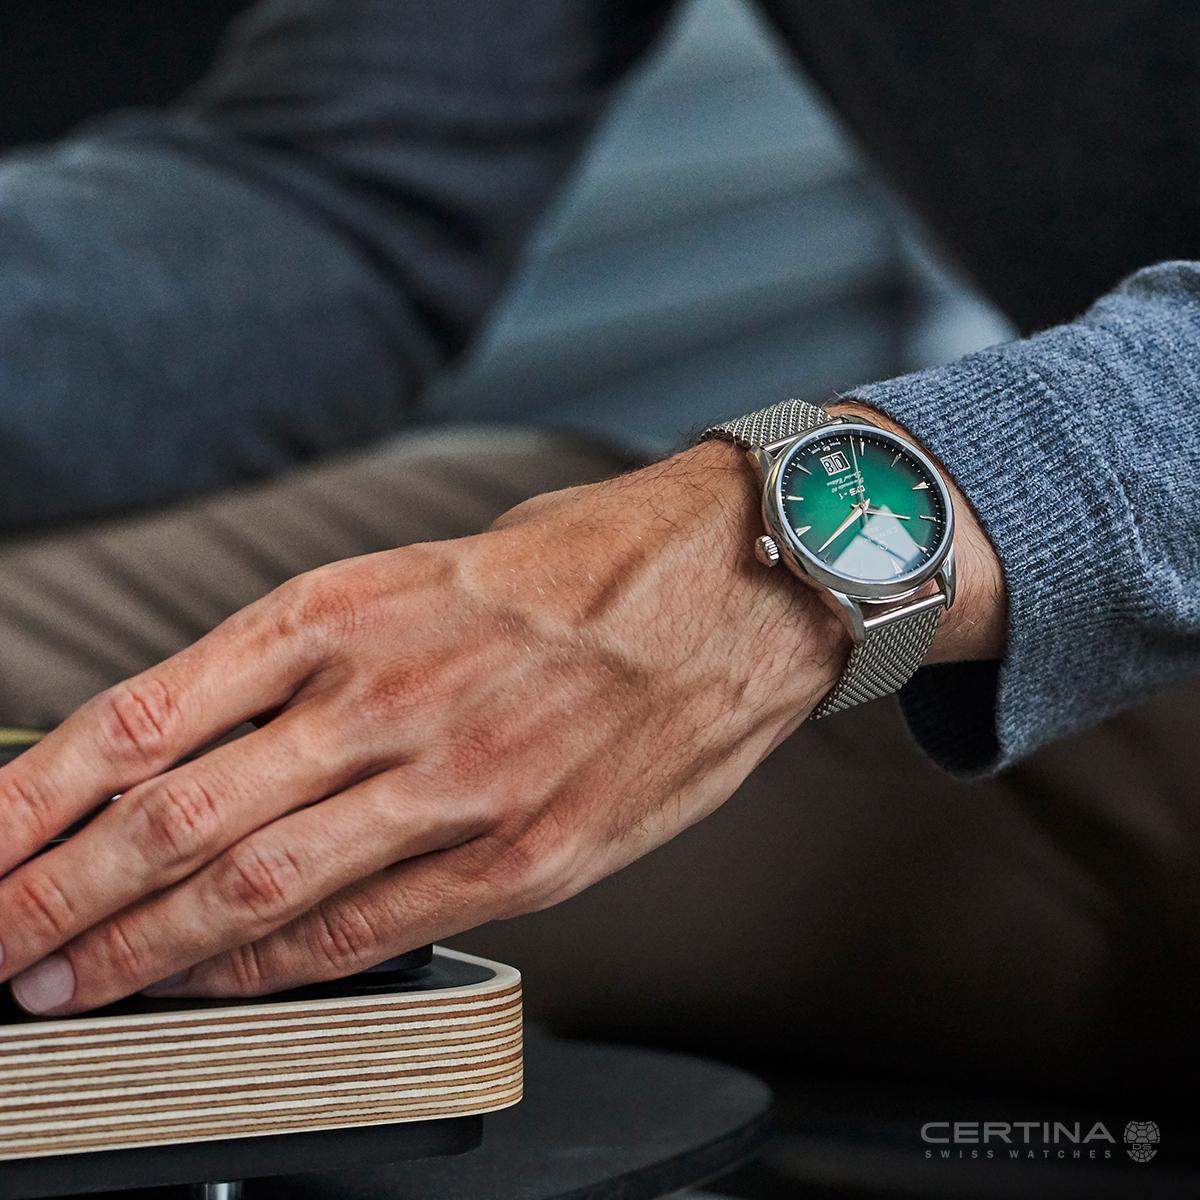 Specjalna edycja zegarka C029.426.11.091.60 - zegarek Certina DS-1 Nivachron™ Big Date 60th Anniversary